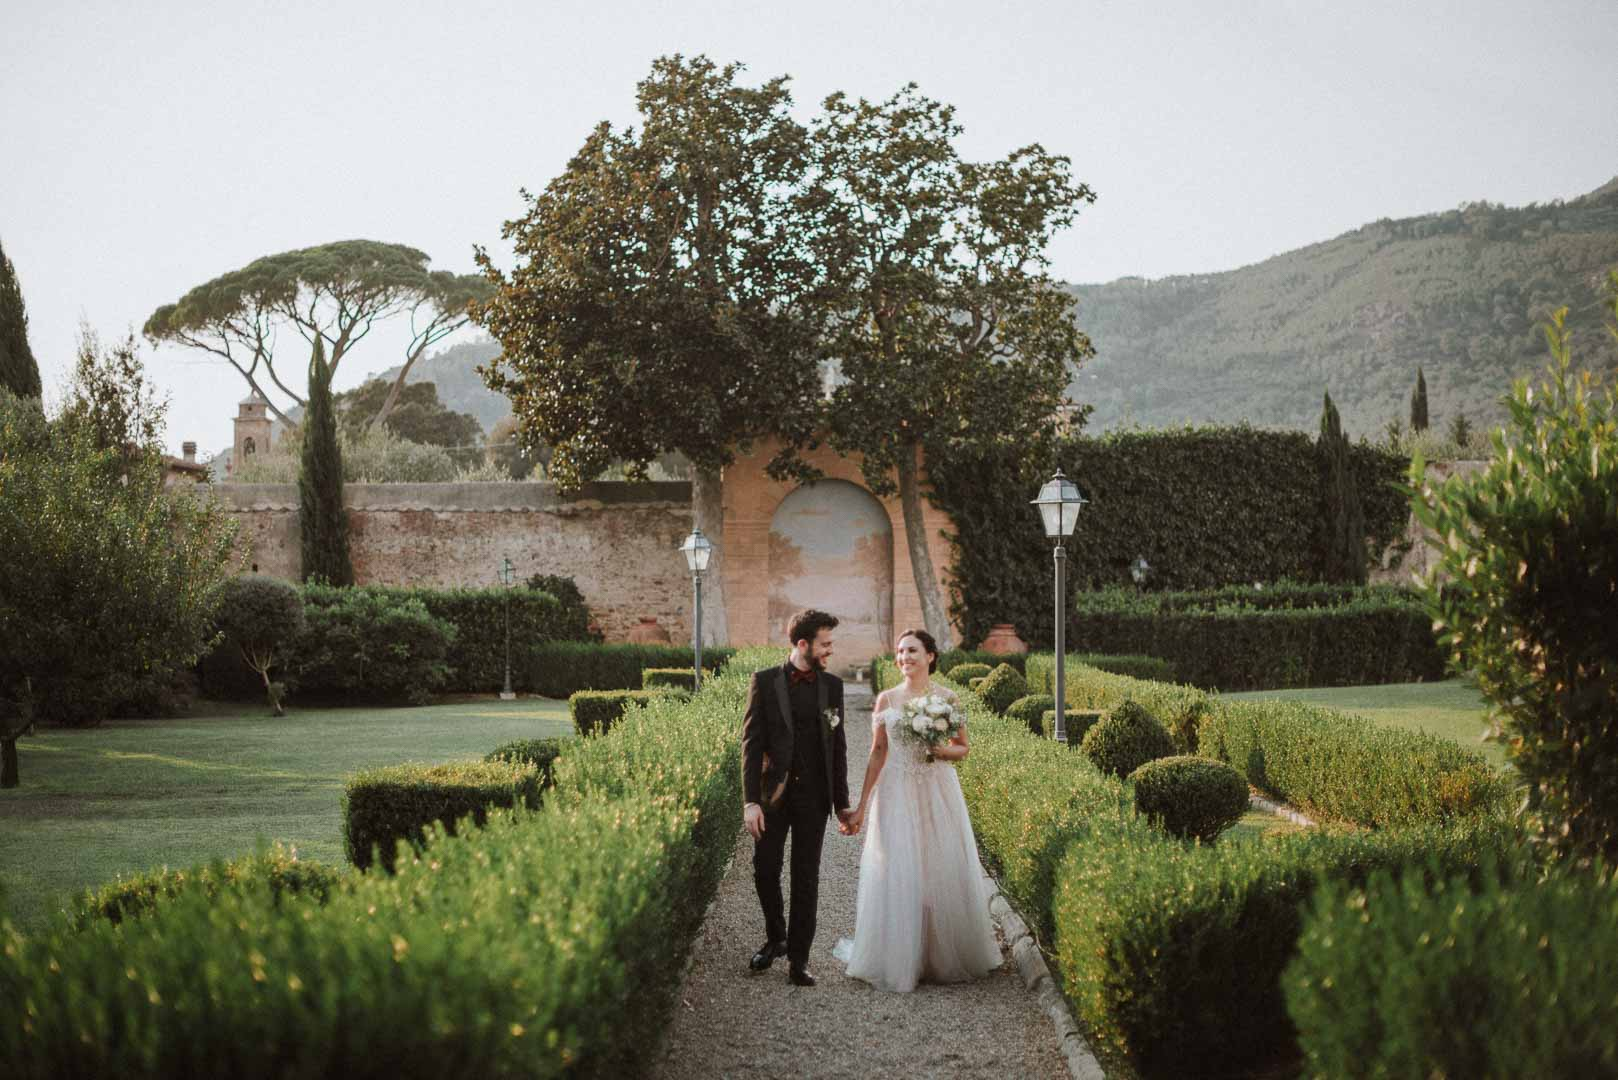 wedding-photographer-destination-fineart-bespoke-reportage-tuscany-villascorzi-vivianeizzo-spazio46-95